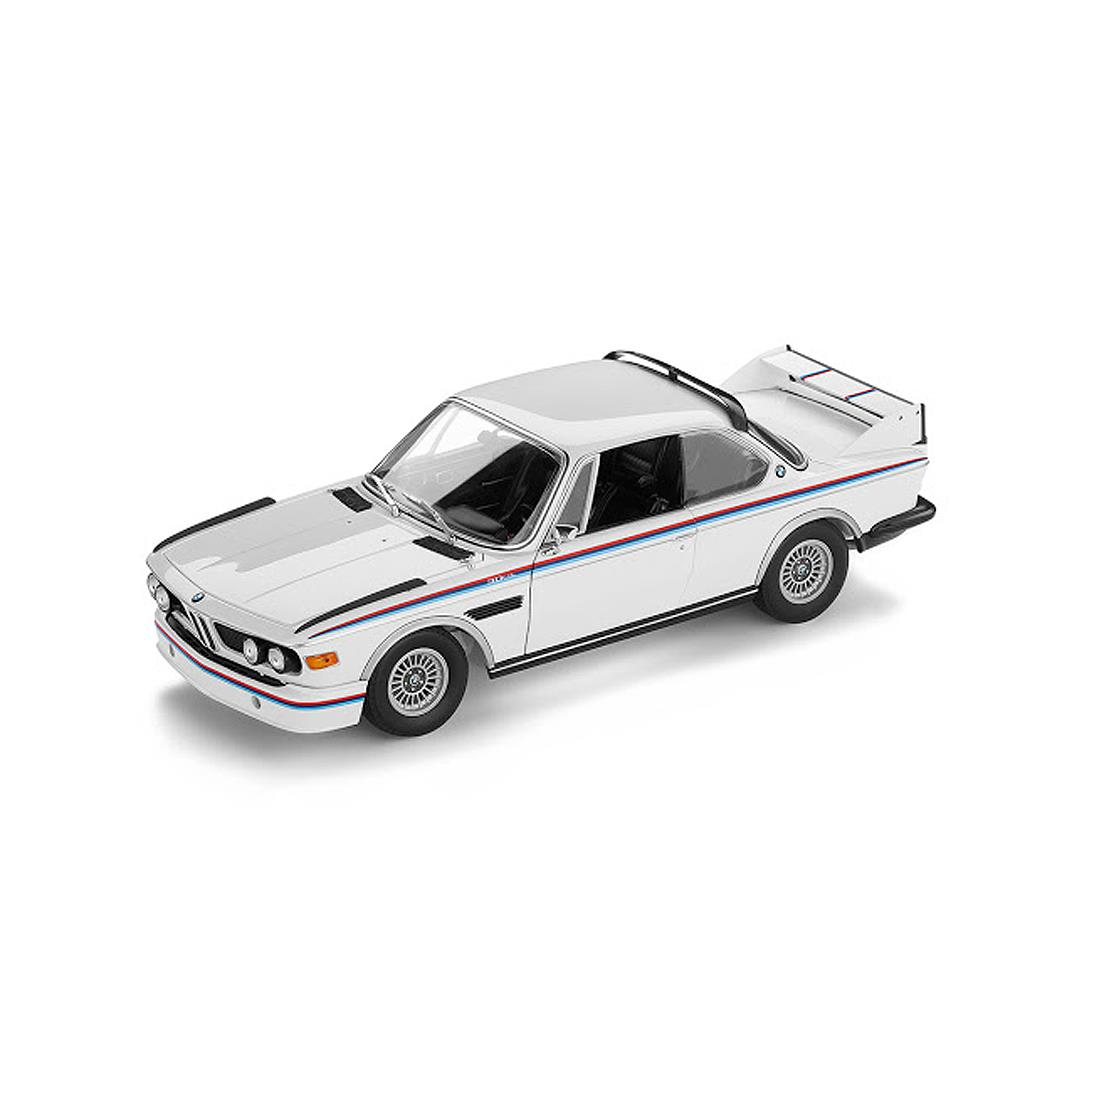 BMW 3.0 CSL Heritage Collection Miniature White